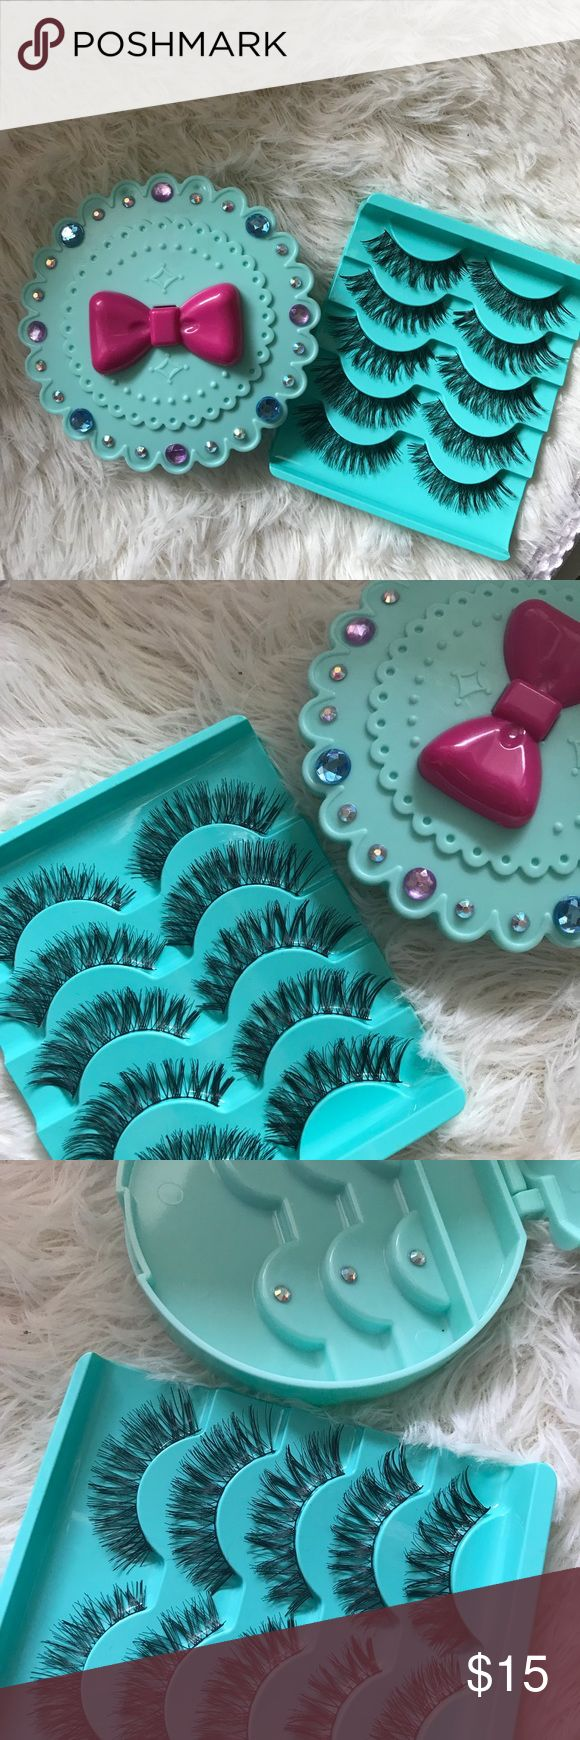 Mermaid eyelash case + 5WSP Lashes All brand new include ✨3 kinds of Wispy eyelashes  ✨Eyelash Case   +$2 Add on eyelash Applicator  +$3 Add on eyelash glue Please message me if you want to add them.    # tags Iconic, mink, red cherry eyelashes, house of lashes, doll, kawaii, case, full, natural,  Koko, Ardell, wispies, Demi , makeup,   Ship within 24 hours ❣️ Makeup False Eyelashes